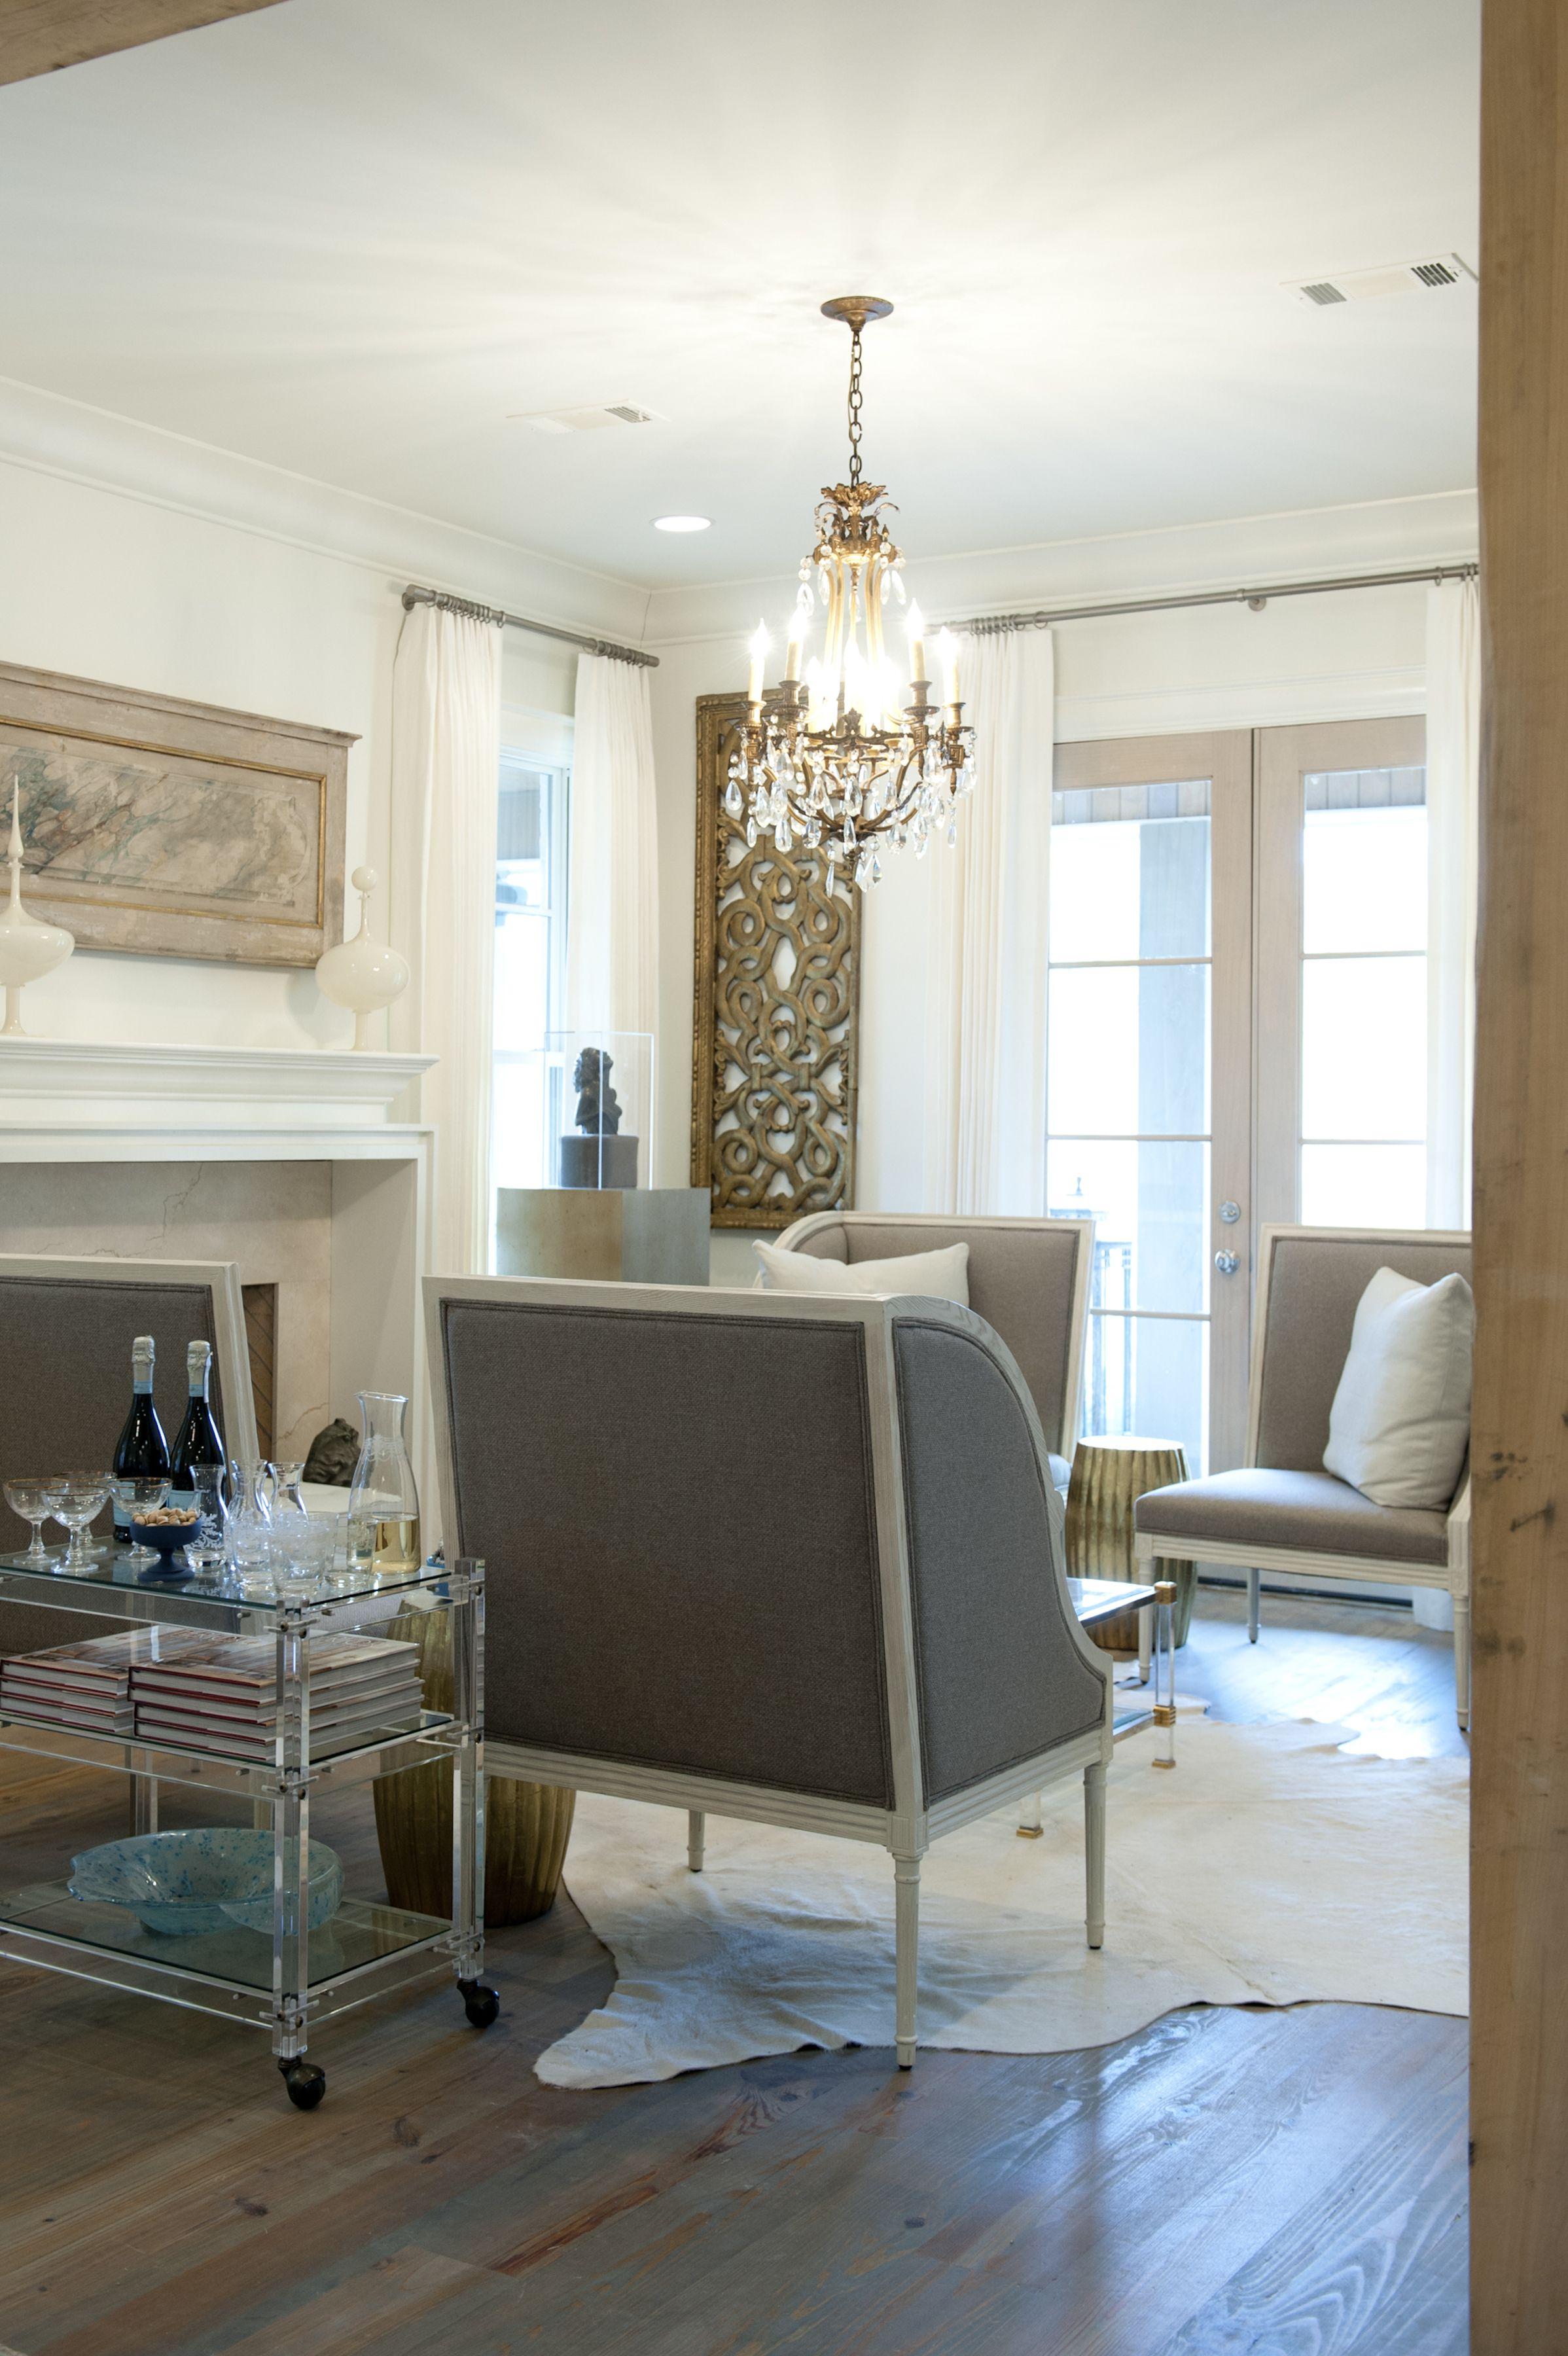 Nancy price interior design show house at livingston madison ms also rh in pinterest